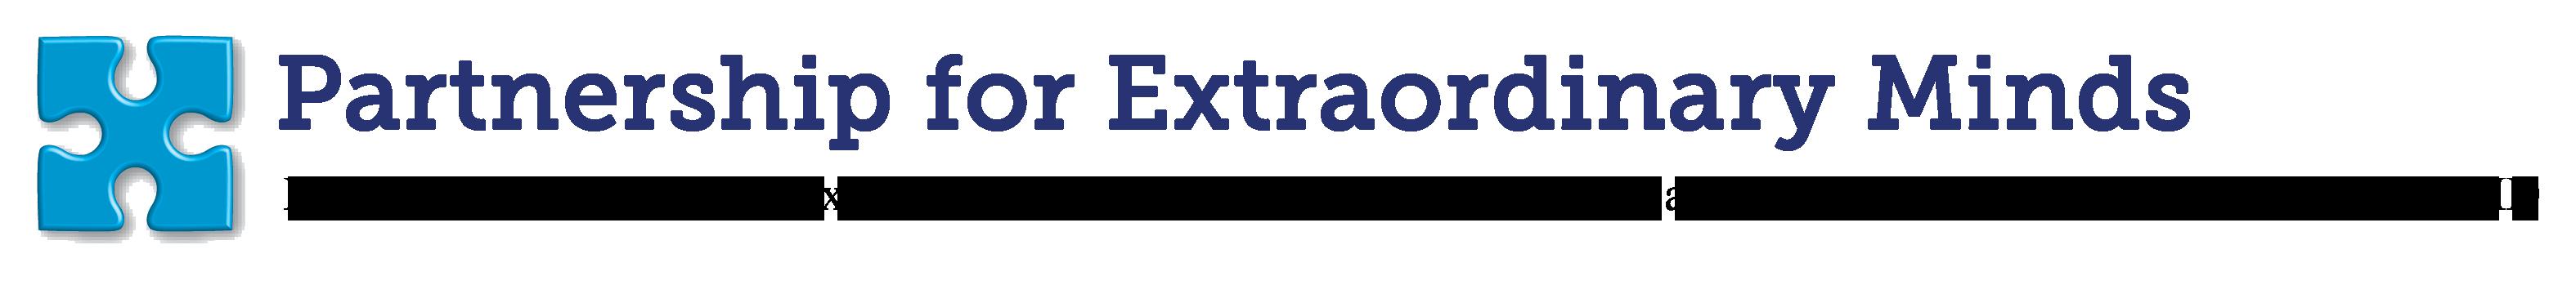 Partnership For Extraordinary Minds Ssl